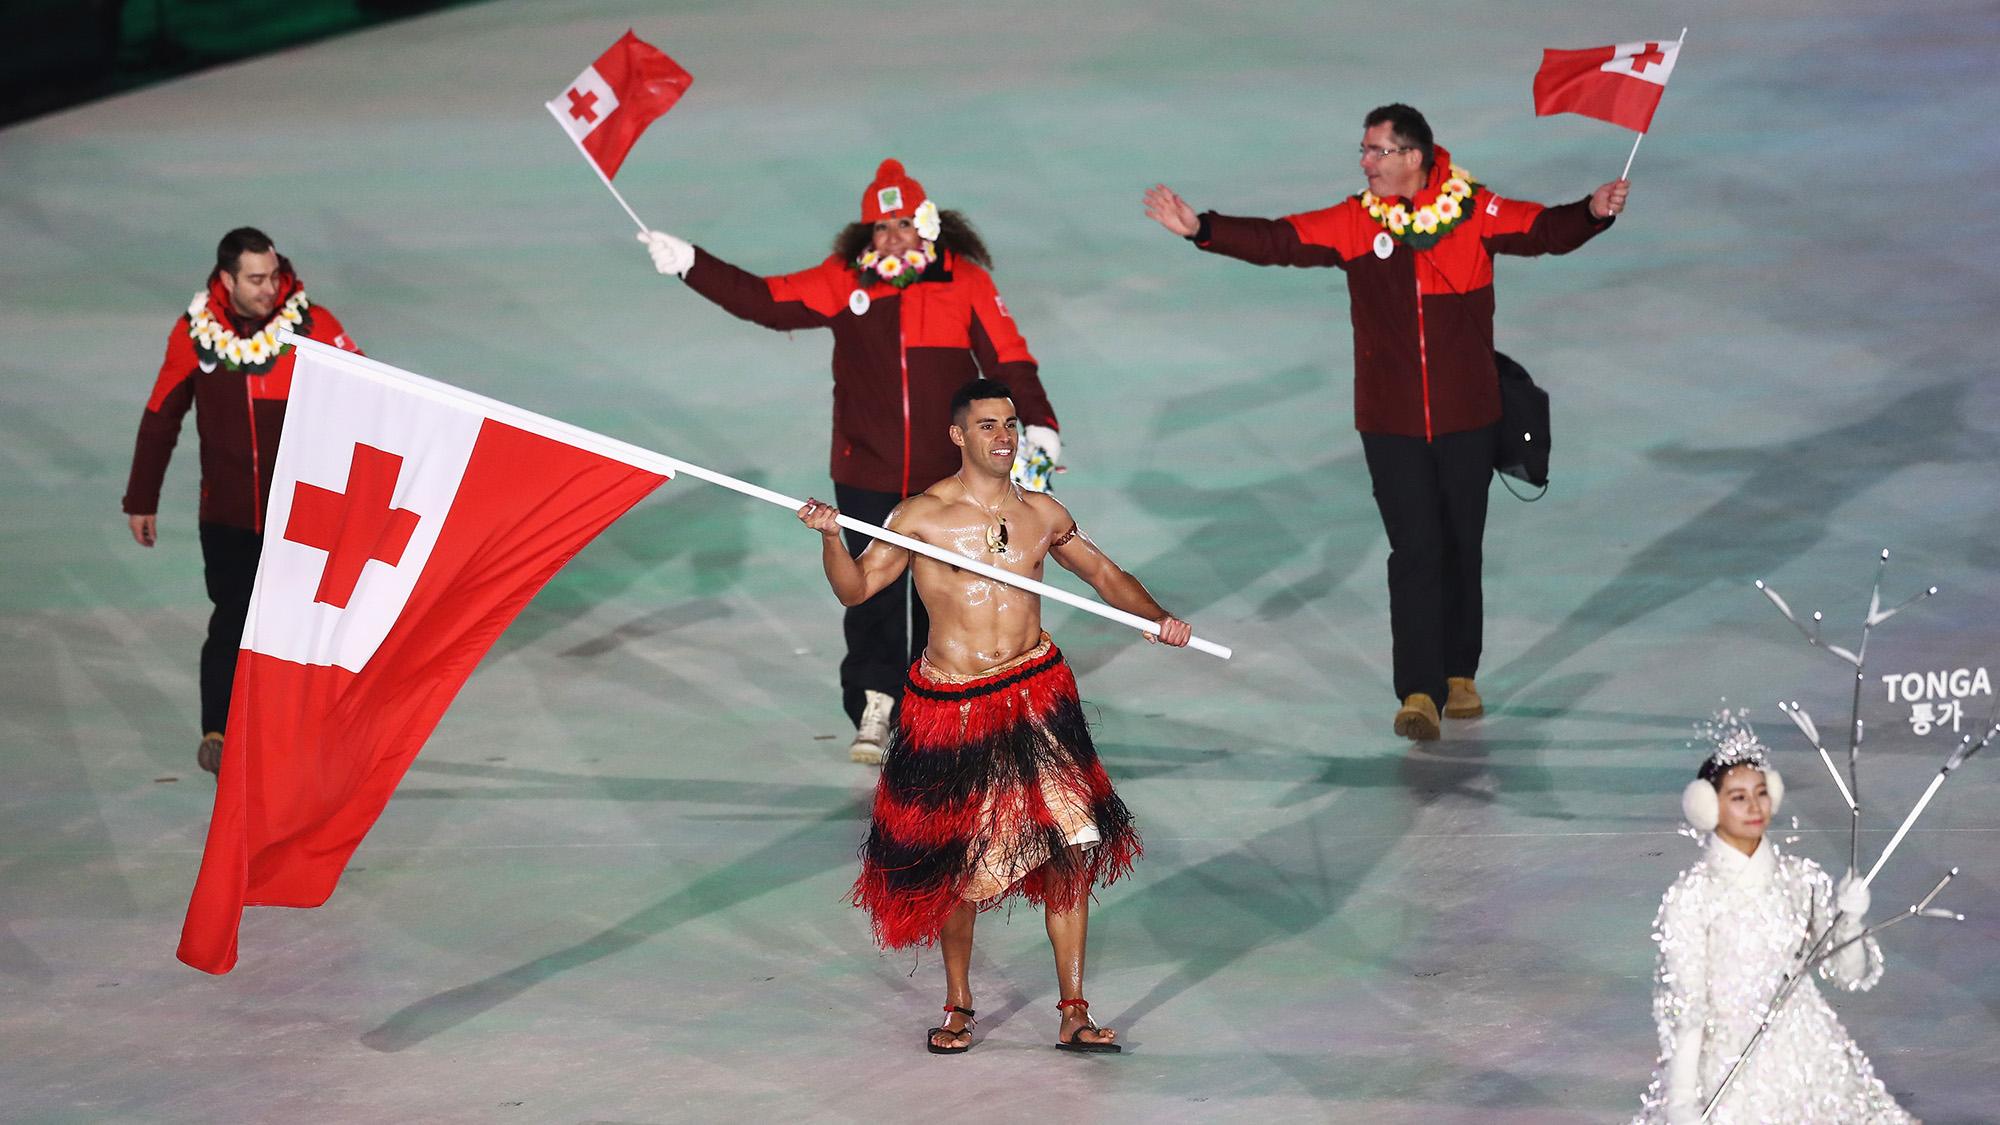 Tonga's shirtless flag bearer returns in PyeongChang